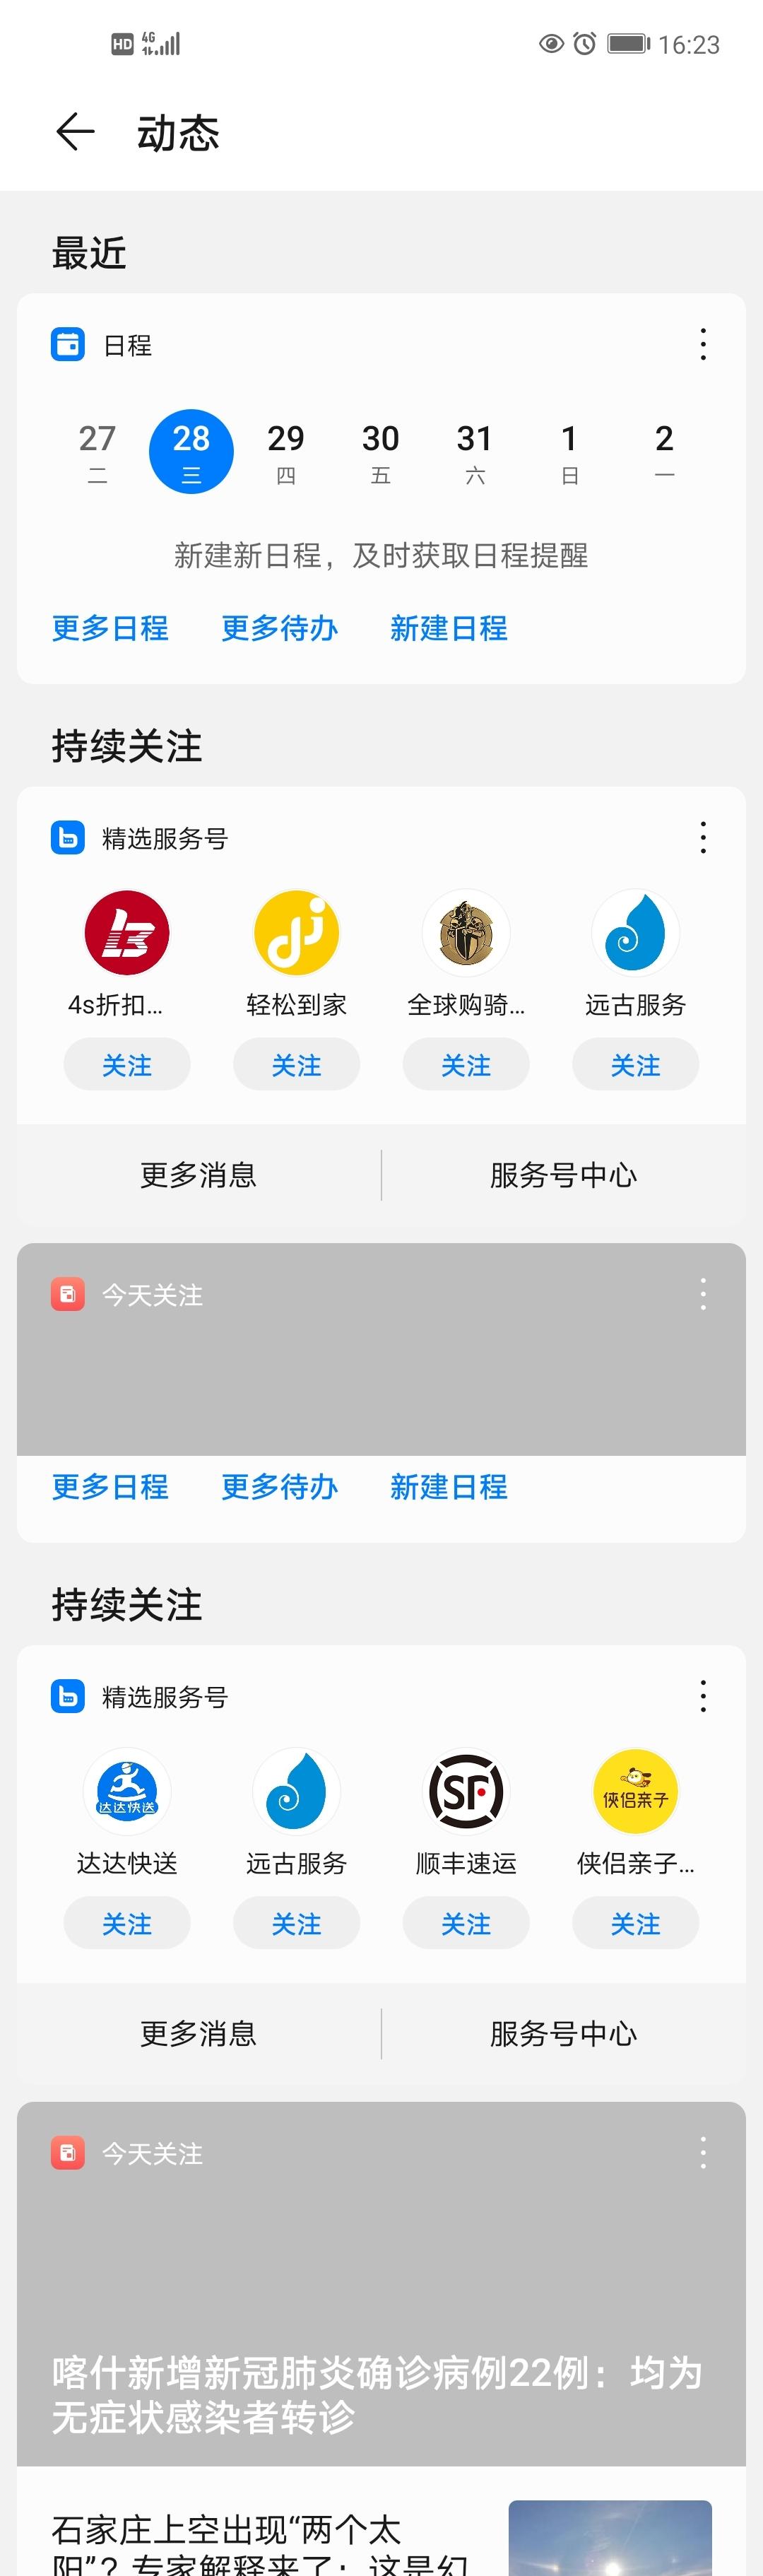 Screenshot_20201028_162353_com.huawei.intelligent.jpg